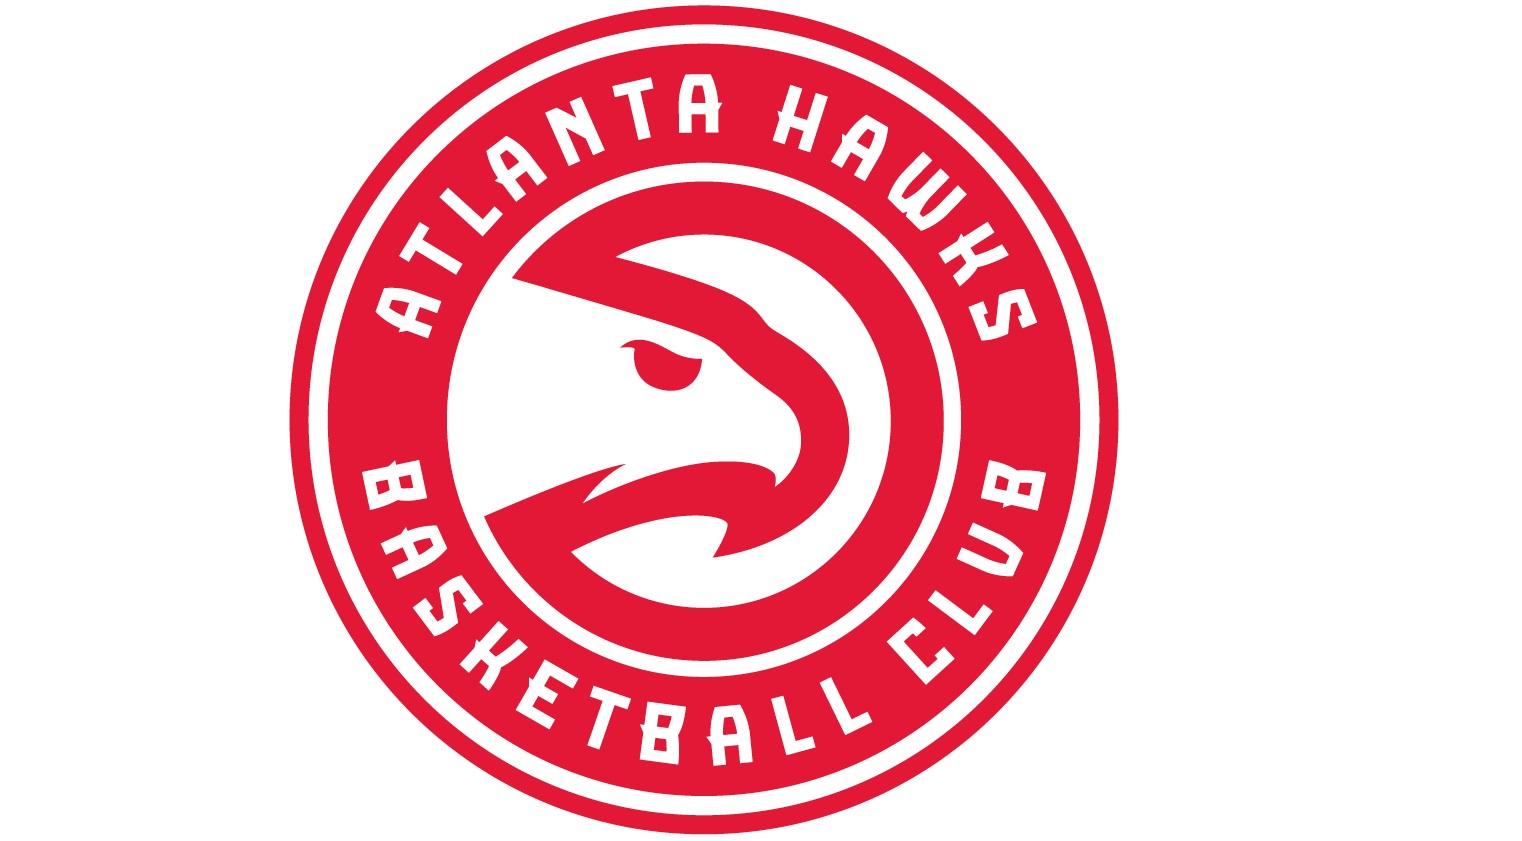 Atlanta Hawks - Primary logo